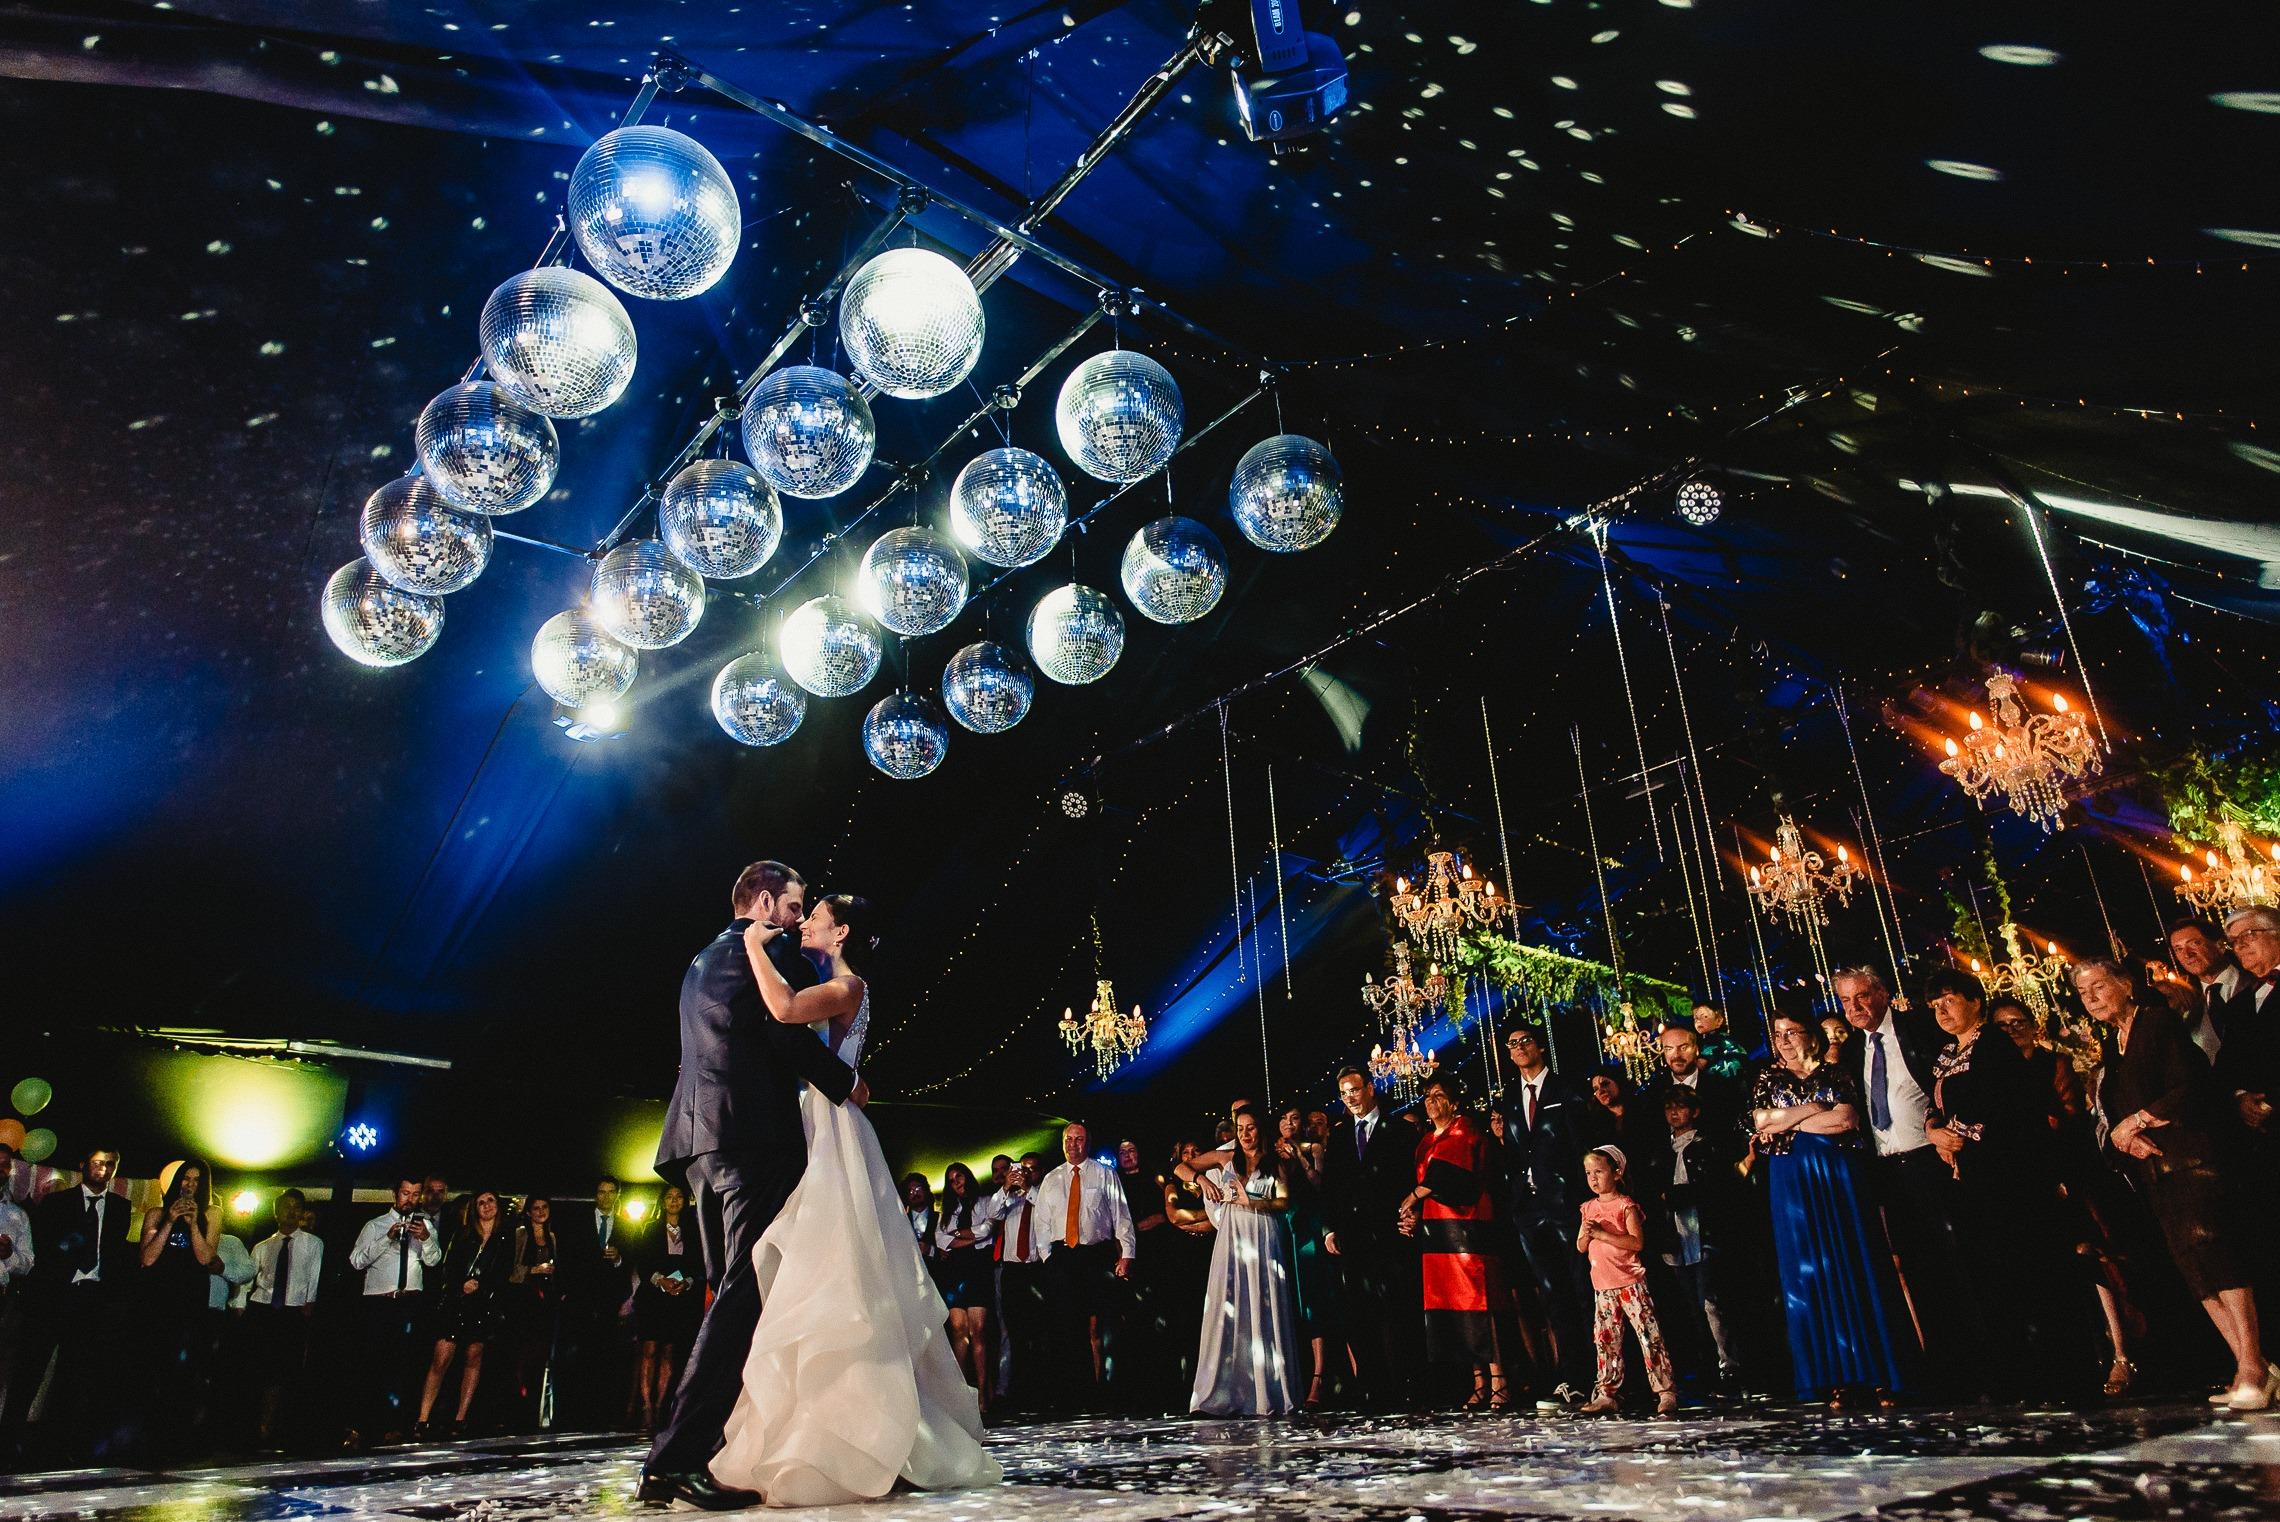 fotografia-matrimonio-chile-argentina-uruguay-bodas-destino-punta-del-este-casamiento-buenos-aires-santiago-concepcion-fotografo-novios